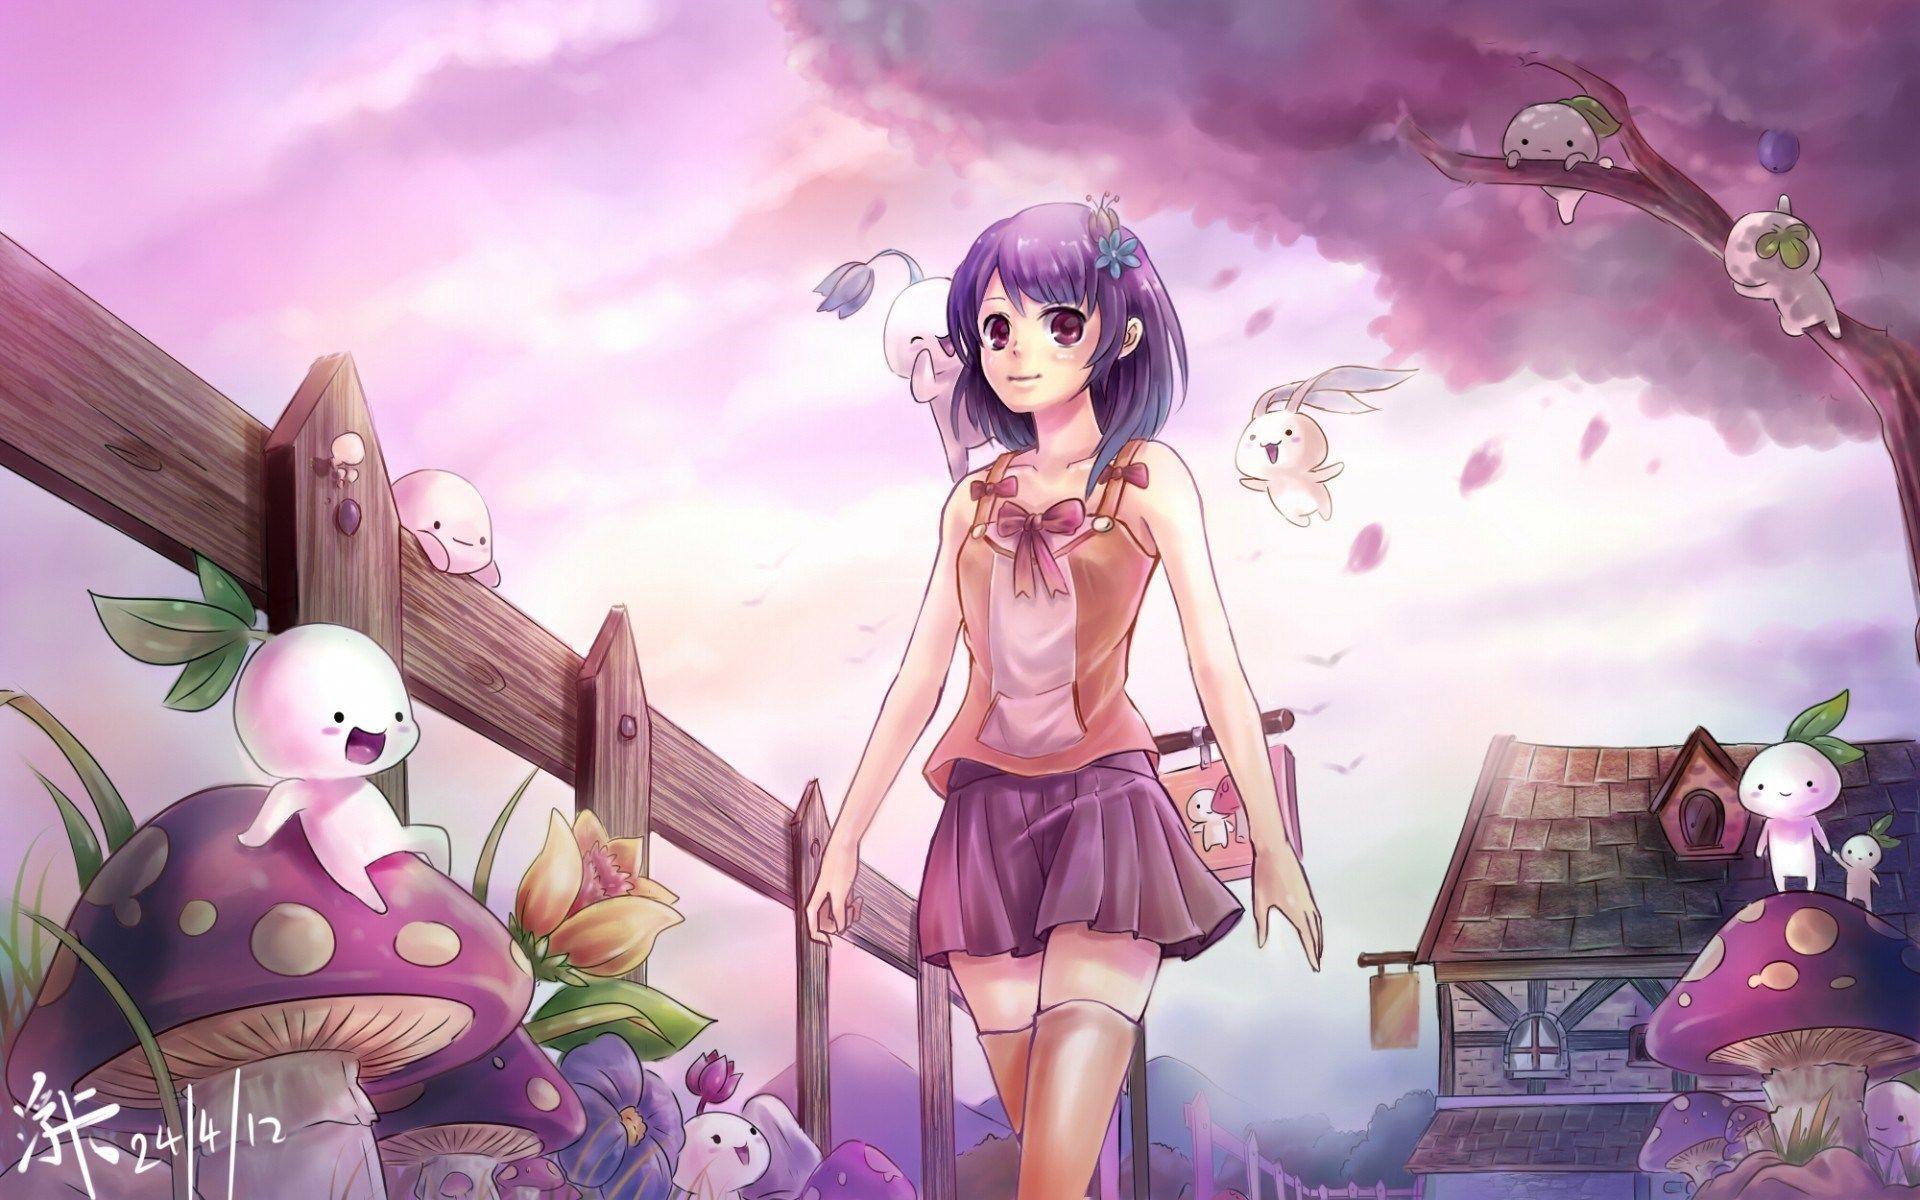 X Cute Anime Wallpaper Hd Wallpaper